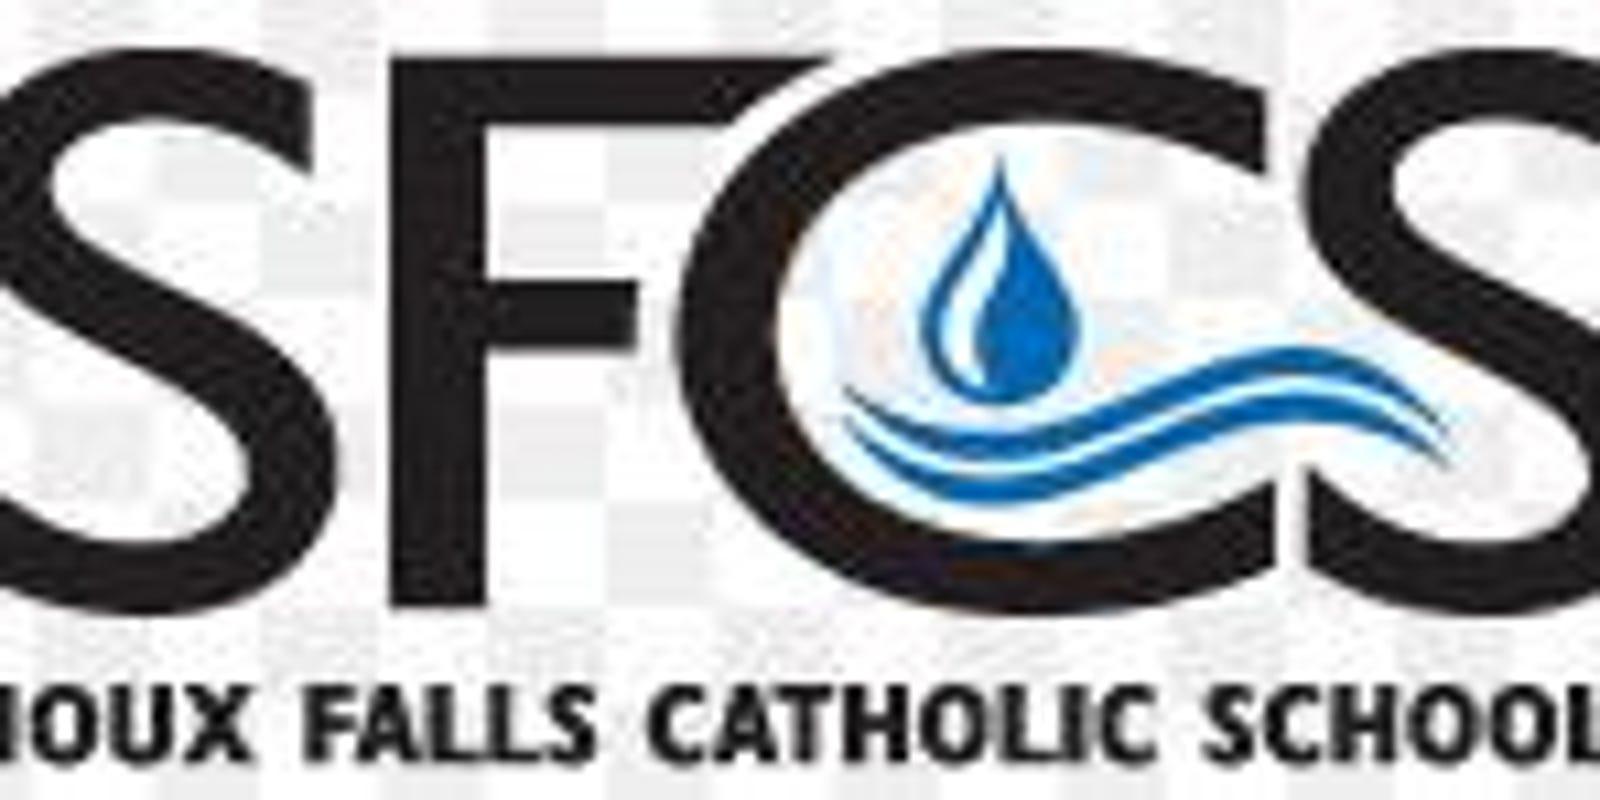 Bishop O'Gorman Catholic Schools logo